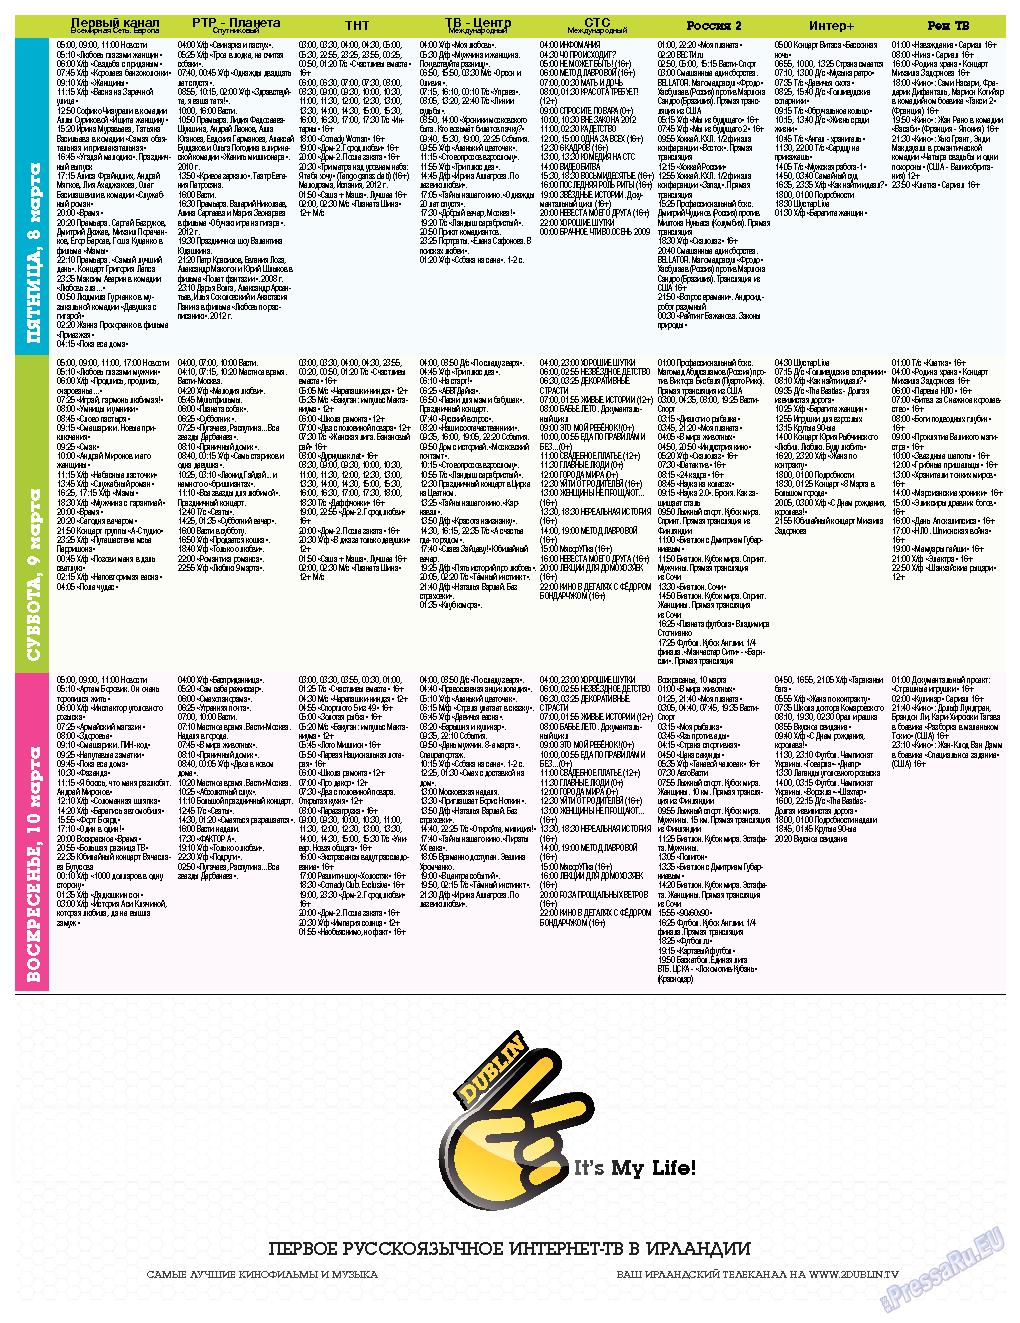 Дублин инфоцентр (газета). 2013 год, номер 8, стр. 9